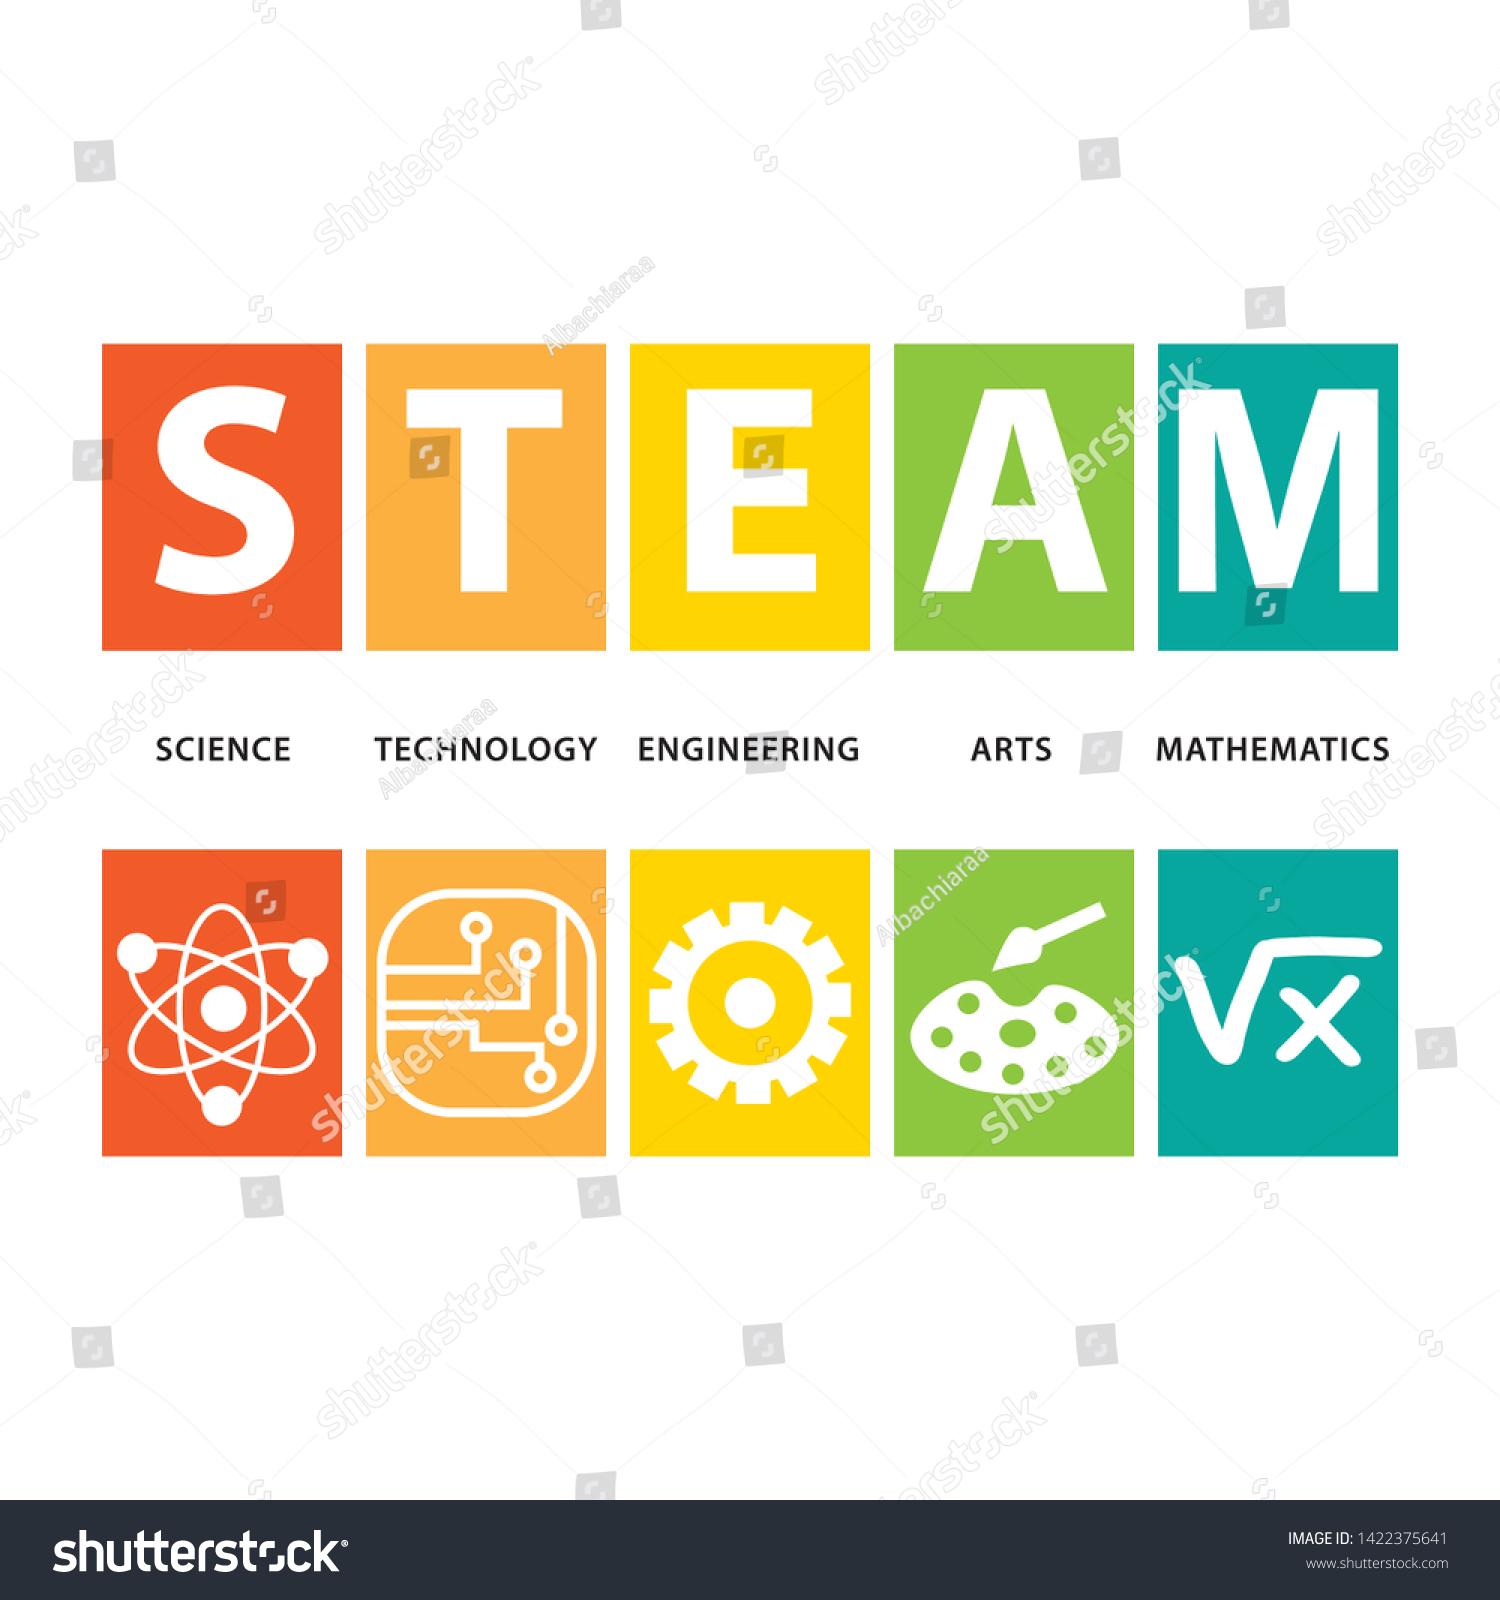 Steam Stem Education Vector Concept Logo Stock Vector Royalty Free 1422375641